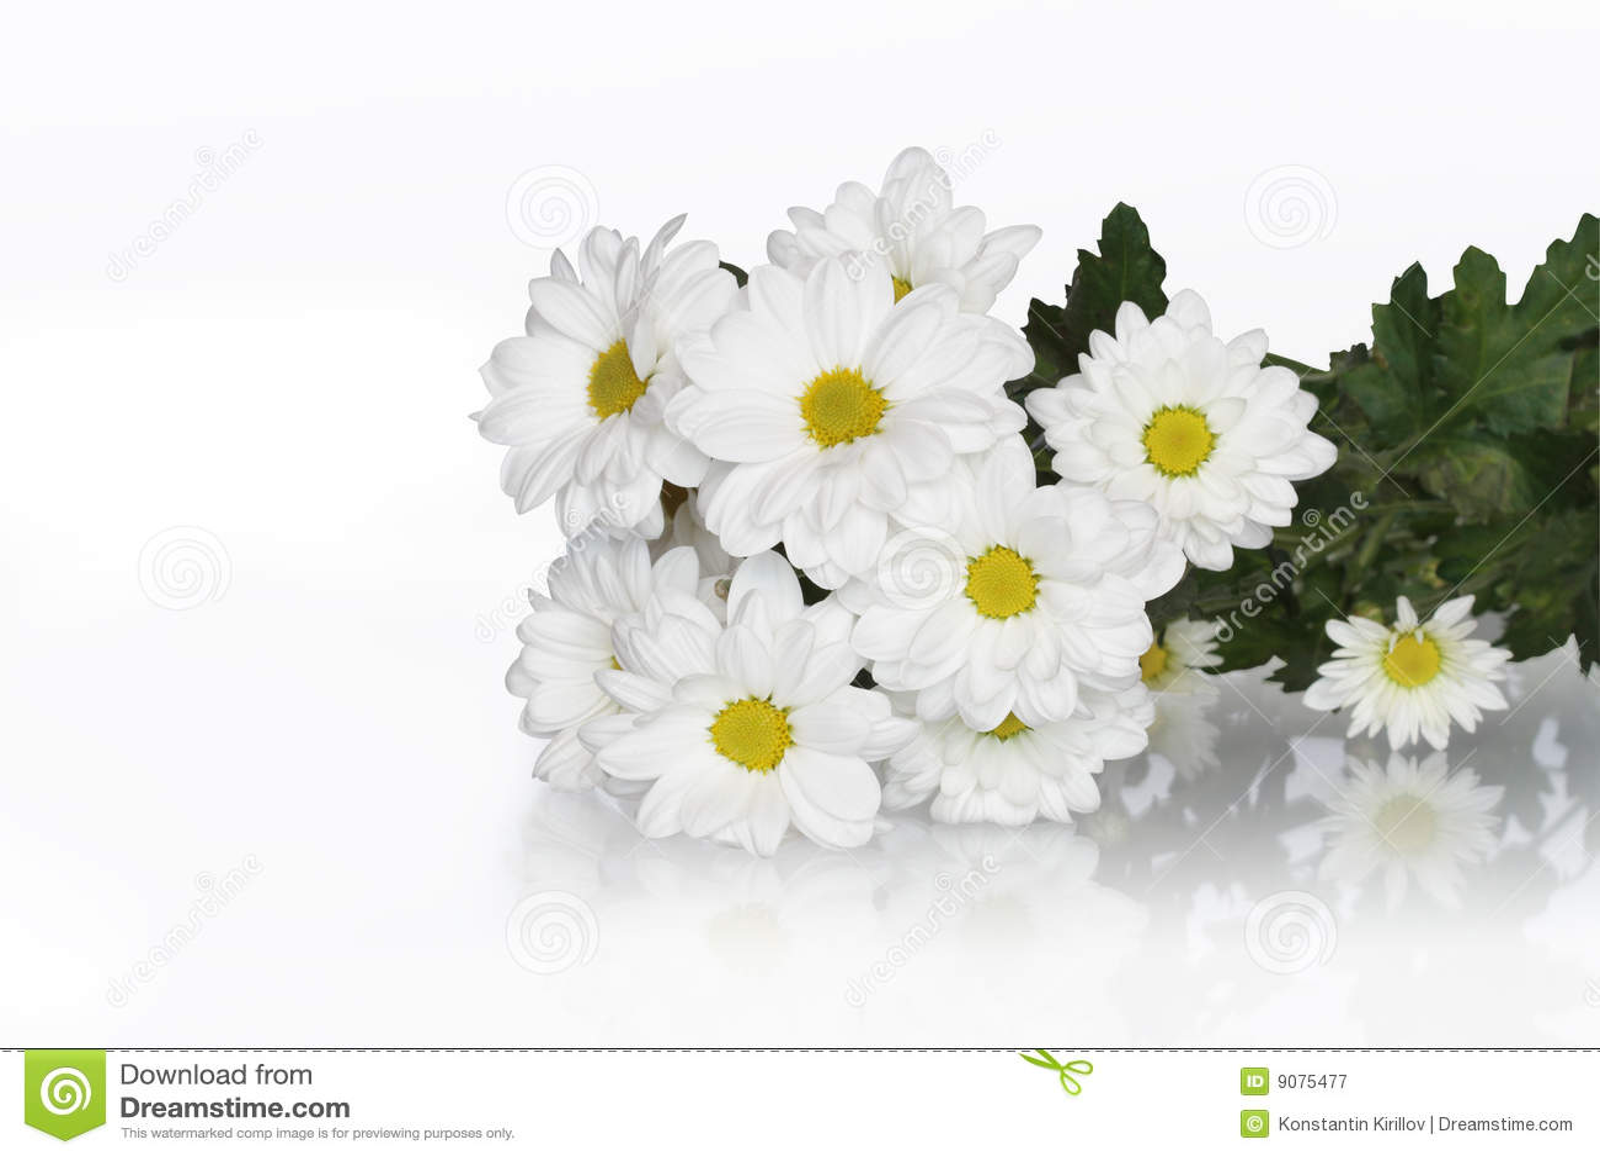 Ochsenauge-Gänseblümchen-Blumenstrauß